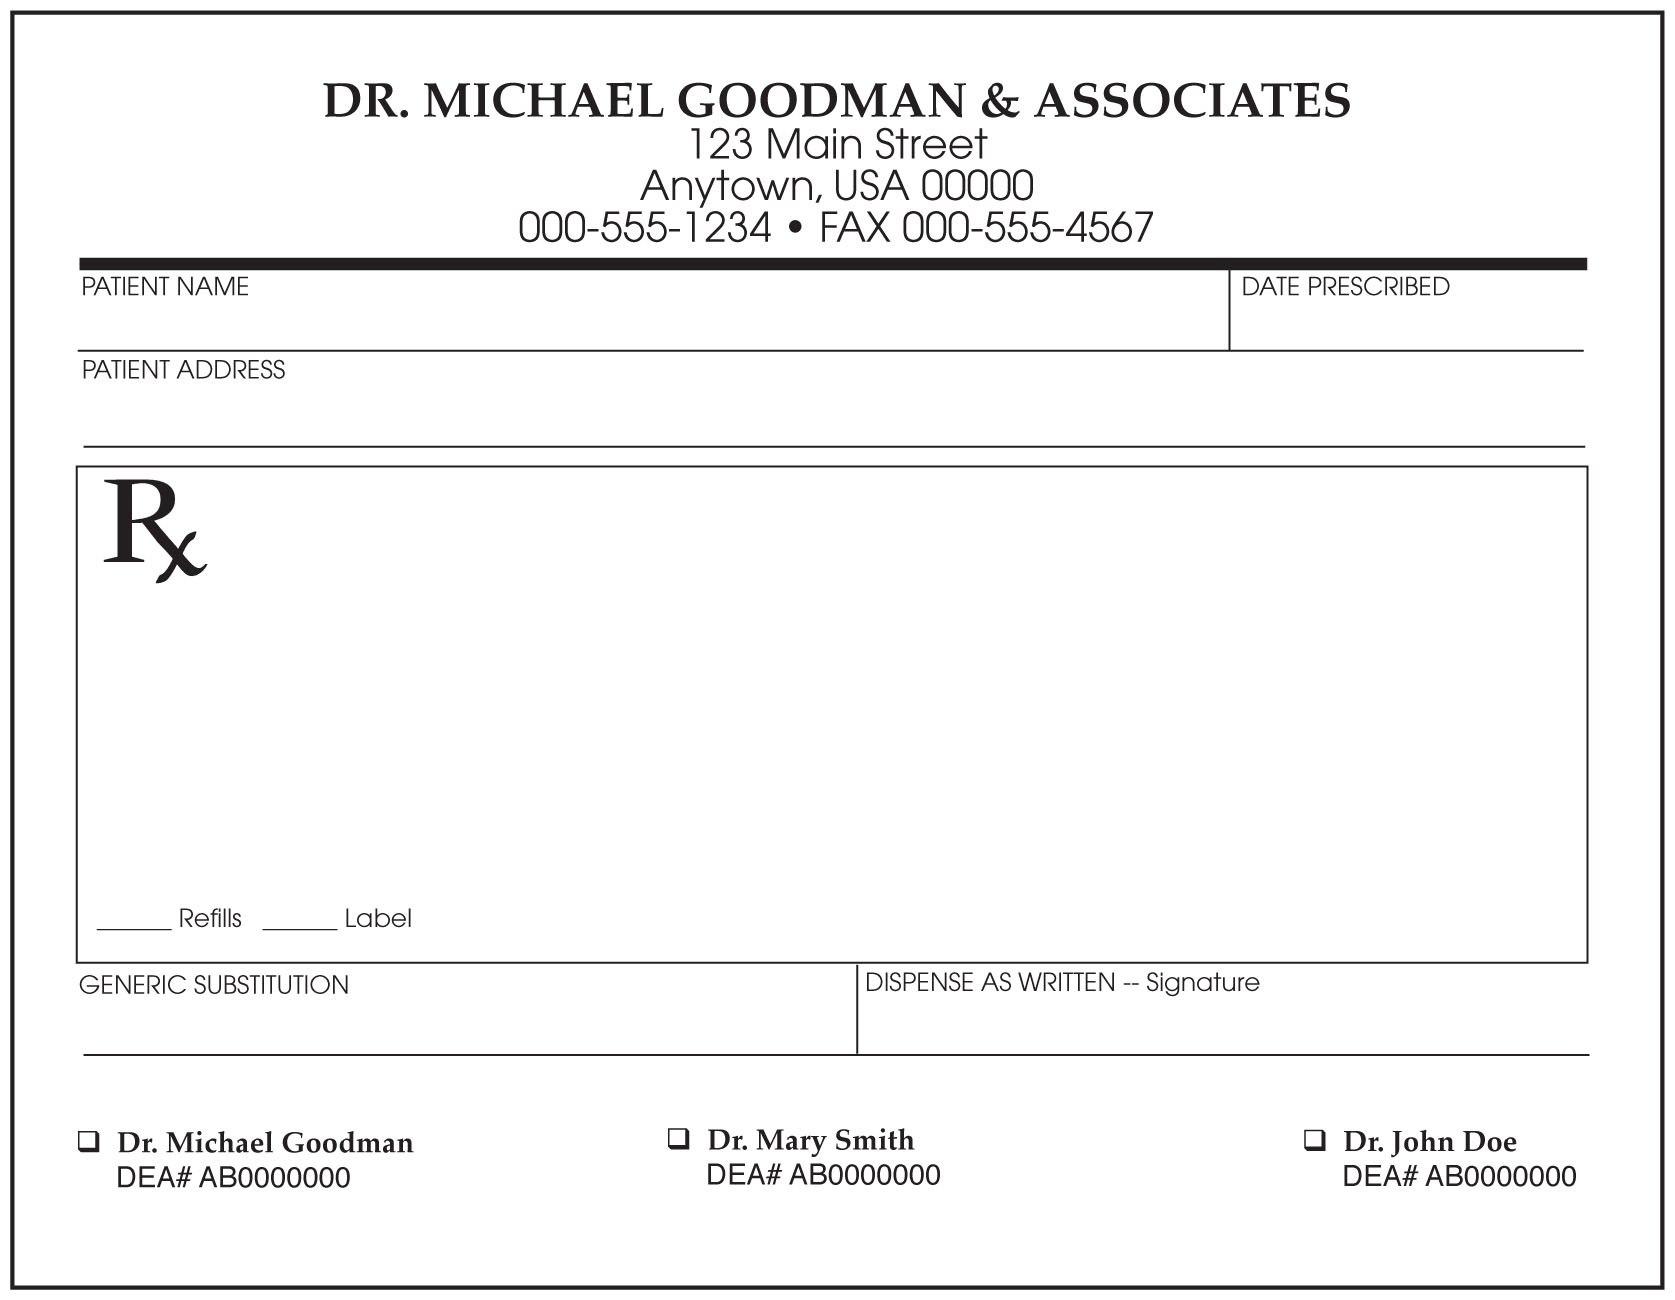 Prescription Templates  Doctor  Pharmacy  Medical Regarding Blank Prescription Form Template